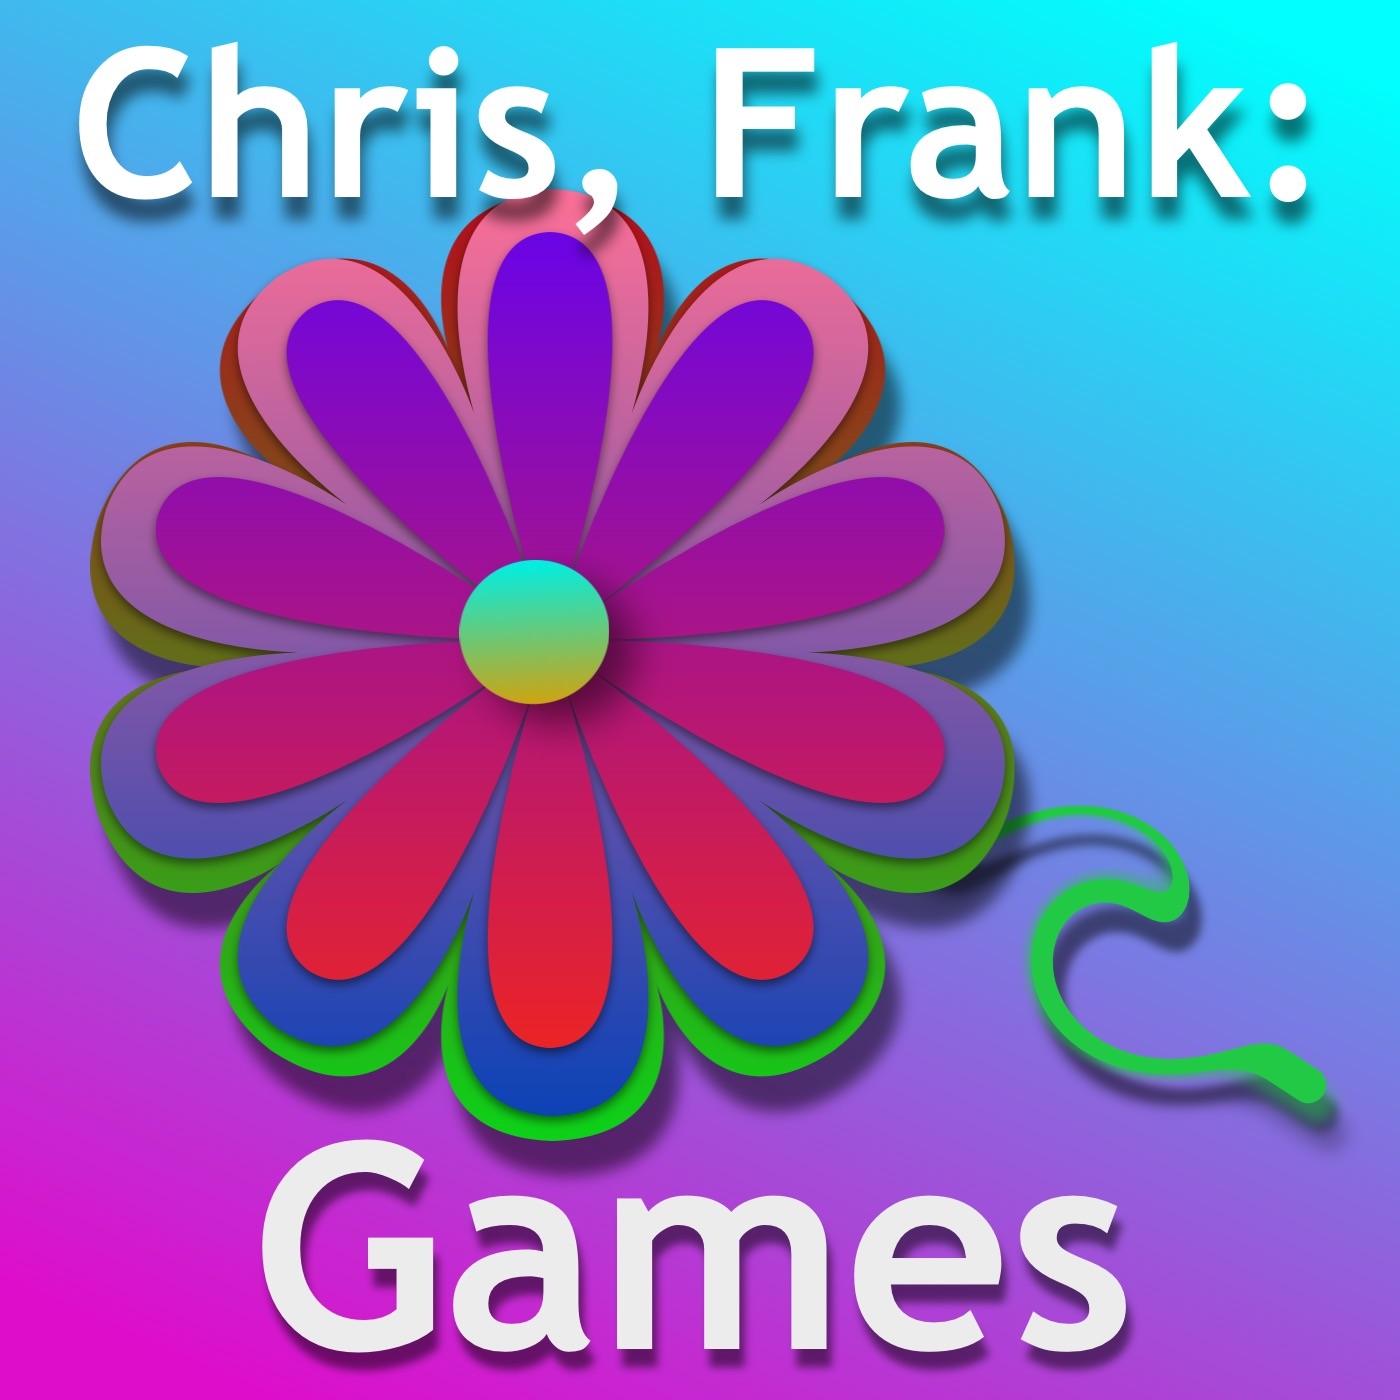 Chris, Frank: Games